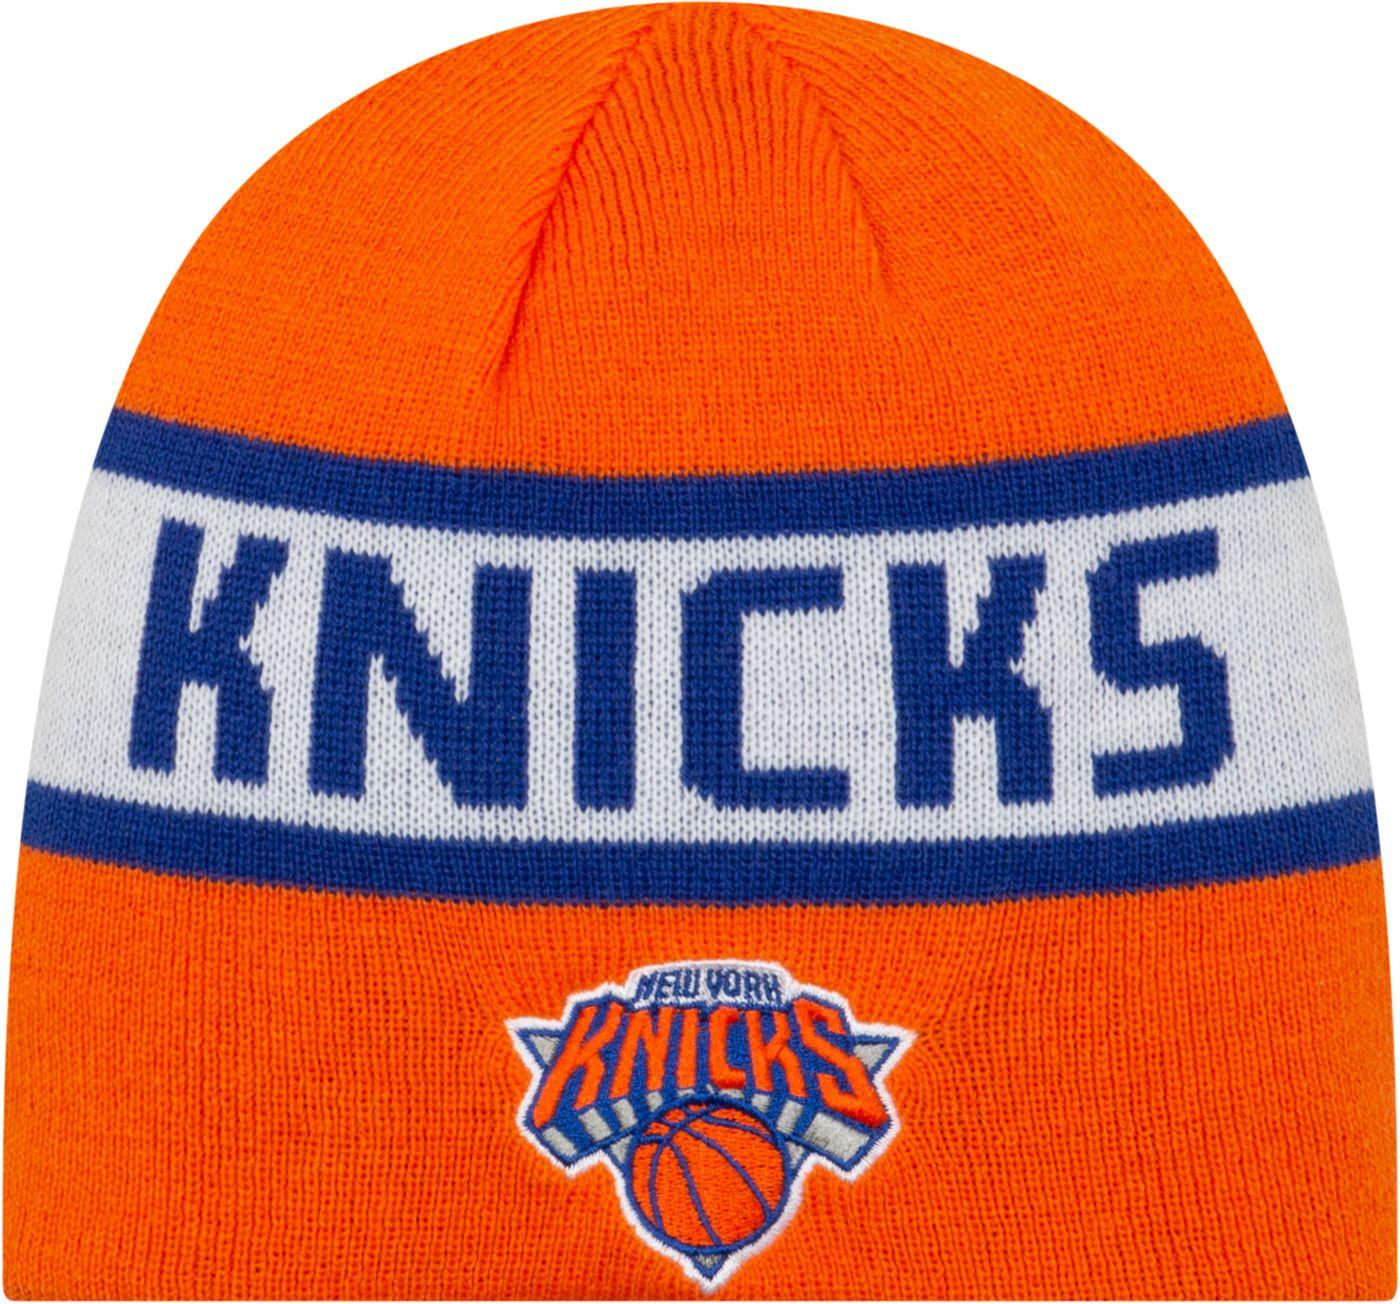 New Era Men's New York Knicks Reversible Sports Knit Hat